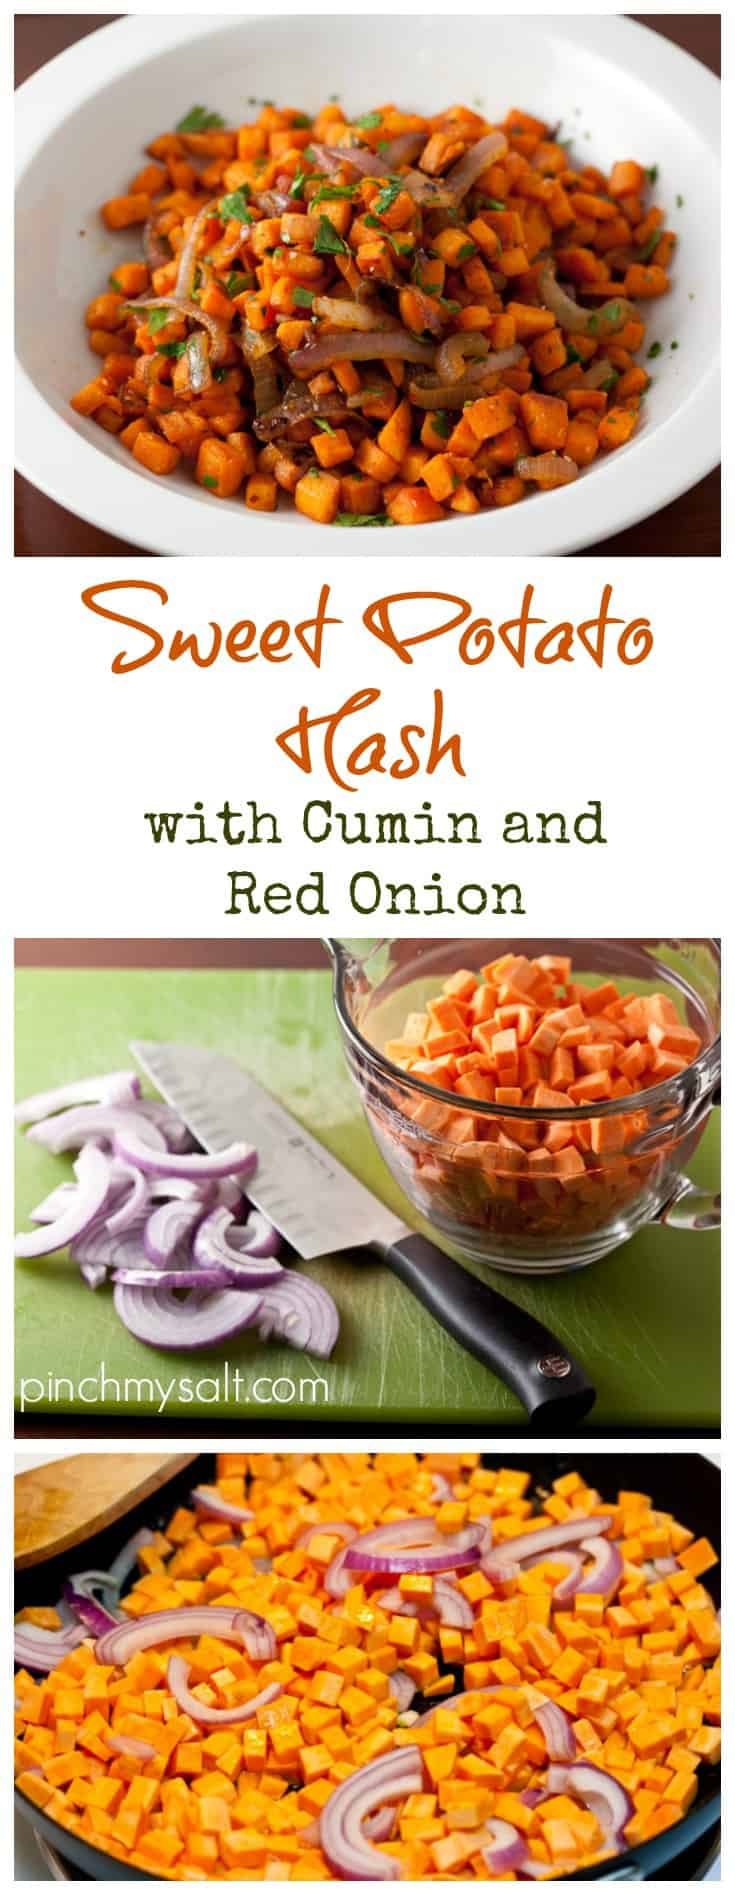 Sweet Potato Hash with Cumin and Red Onion | pinchmysalt.com